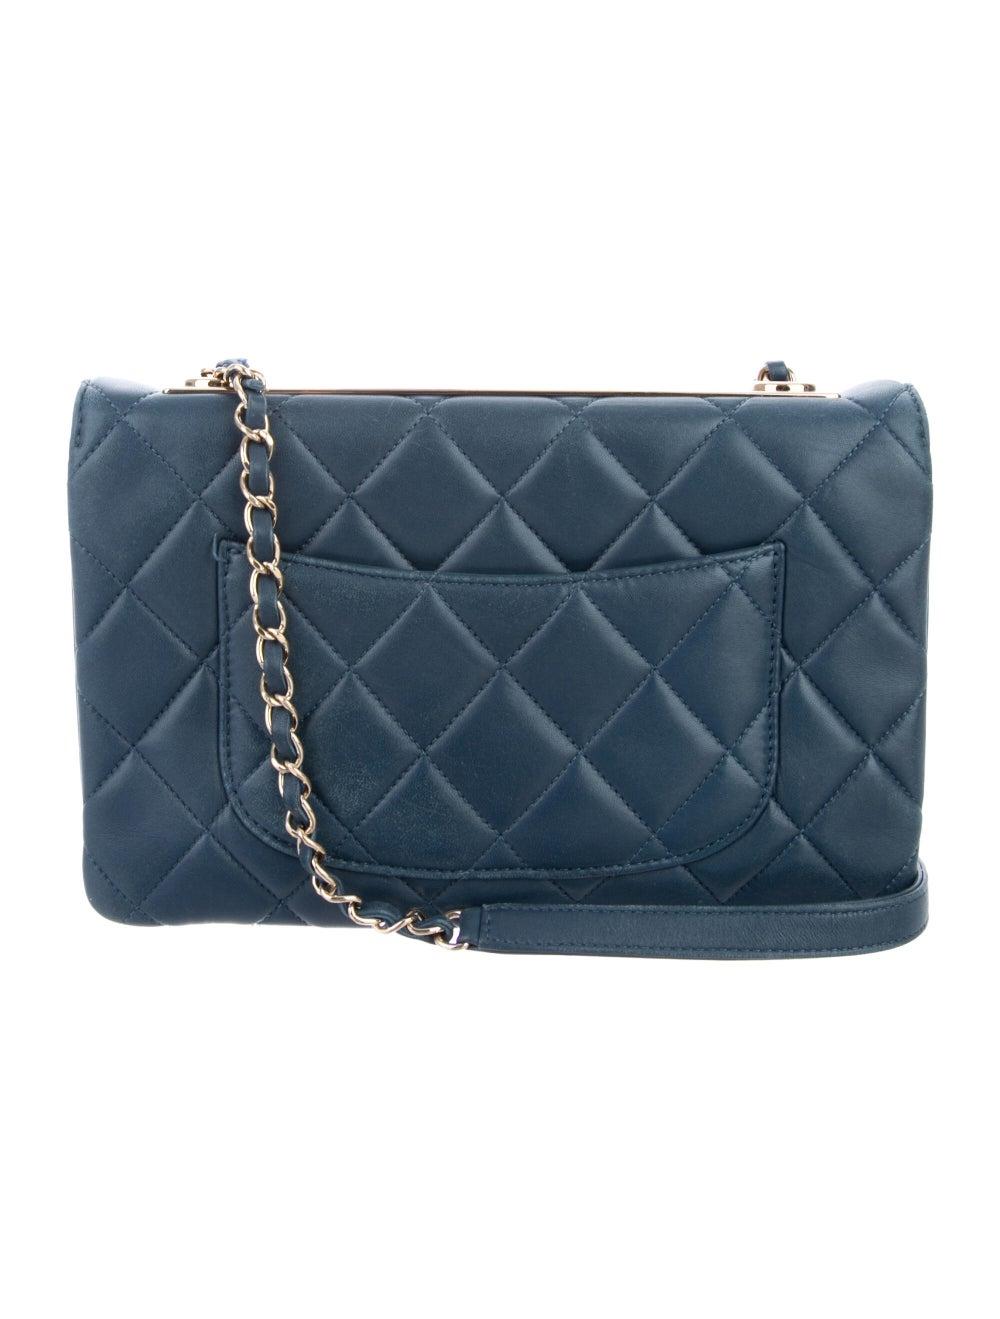 Chanel Trendy CC Flap Bag Blue - image 4